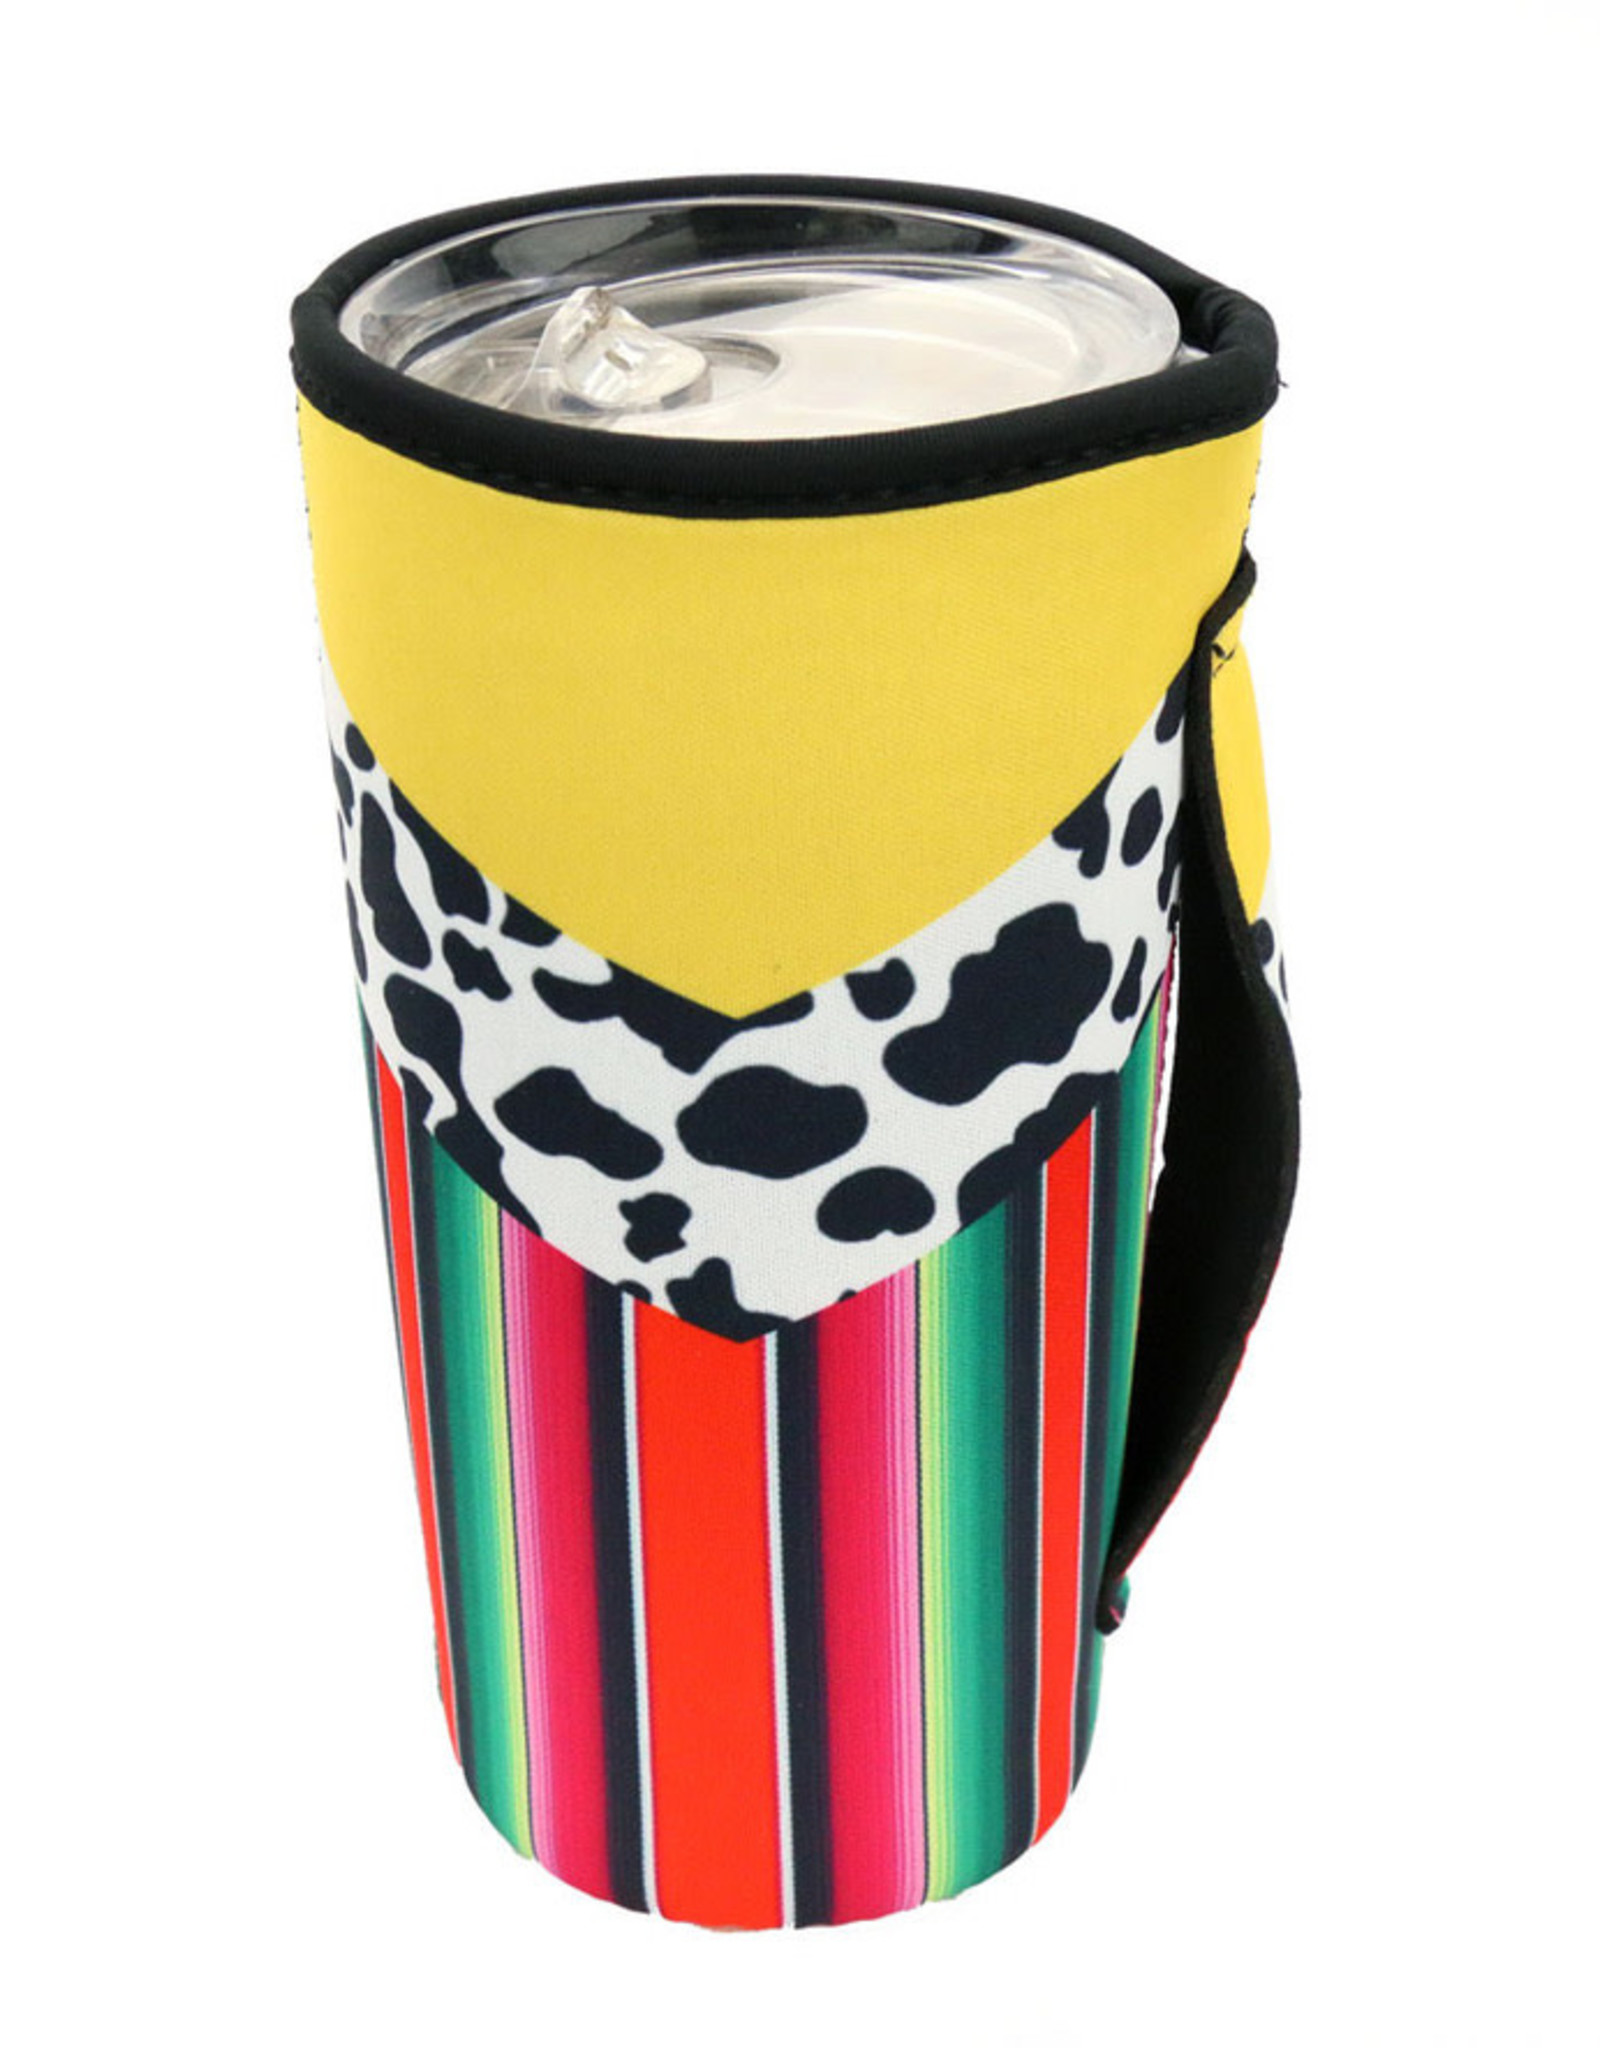 DRINK SLEEVE KOOZIE 20 - 30 OZ TUMBLER COOLER NEOPRENE WITH HANDLE